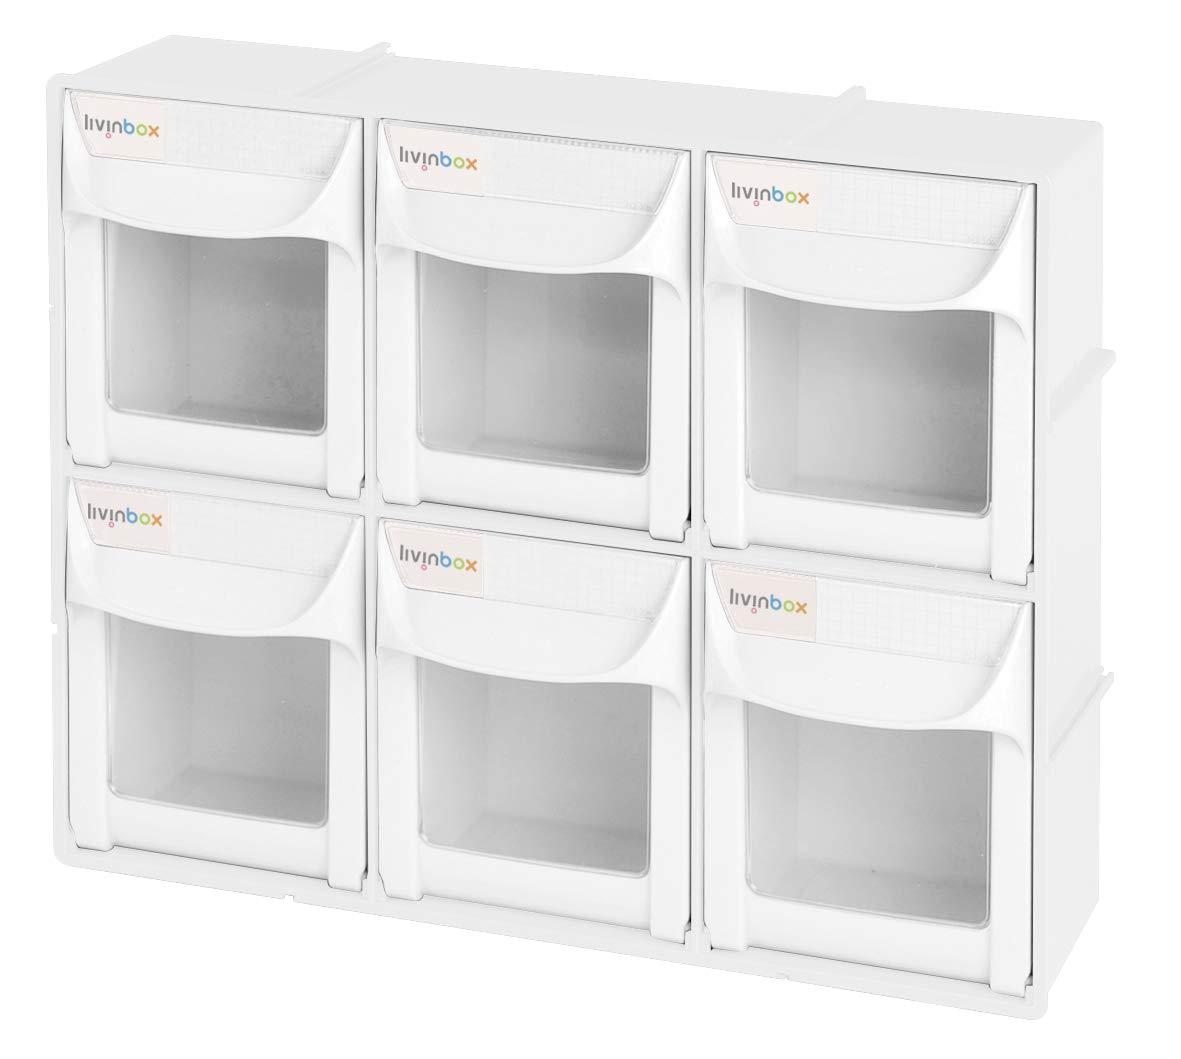 Amazon.com: livinbox FO-306 - Sistema de cubo de basura con ...